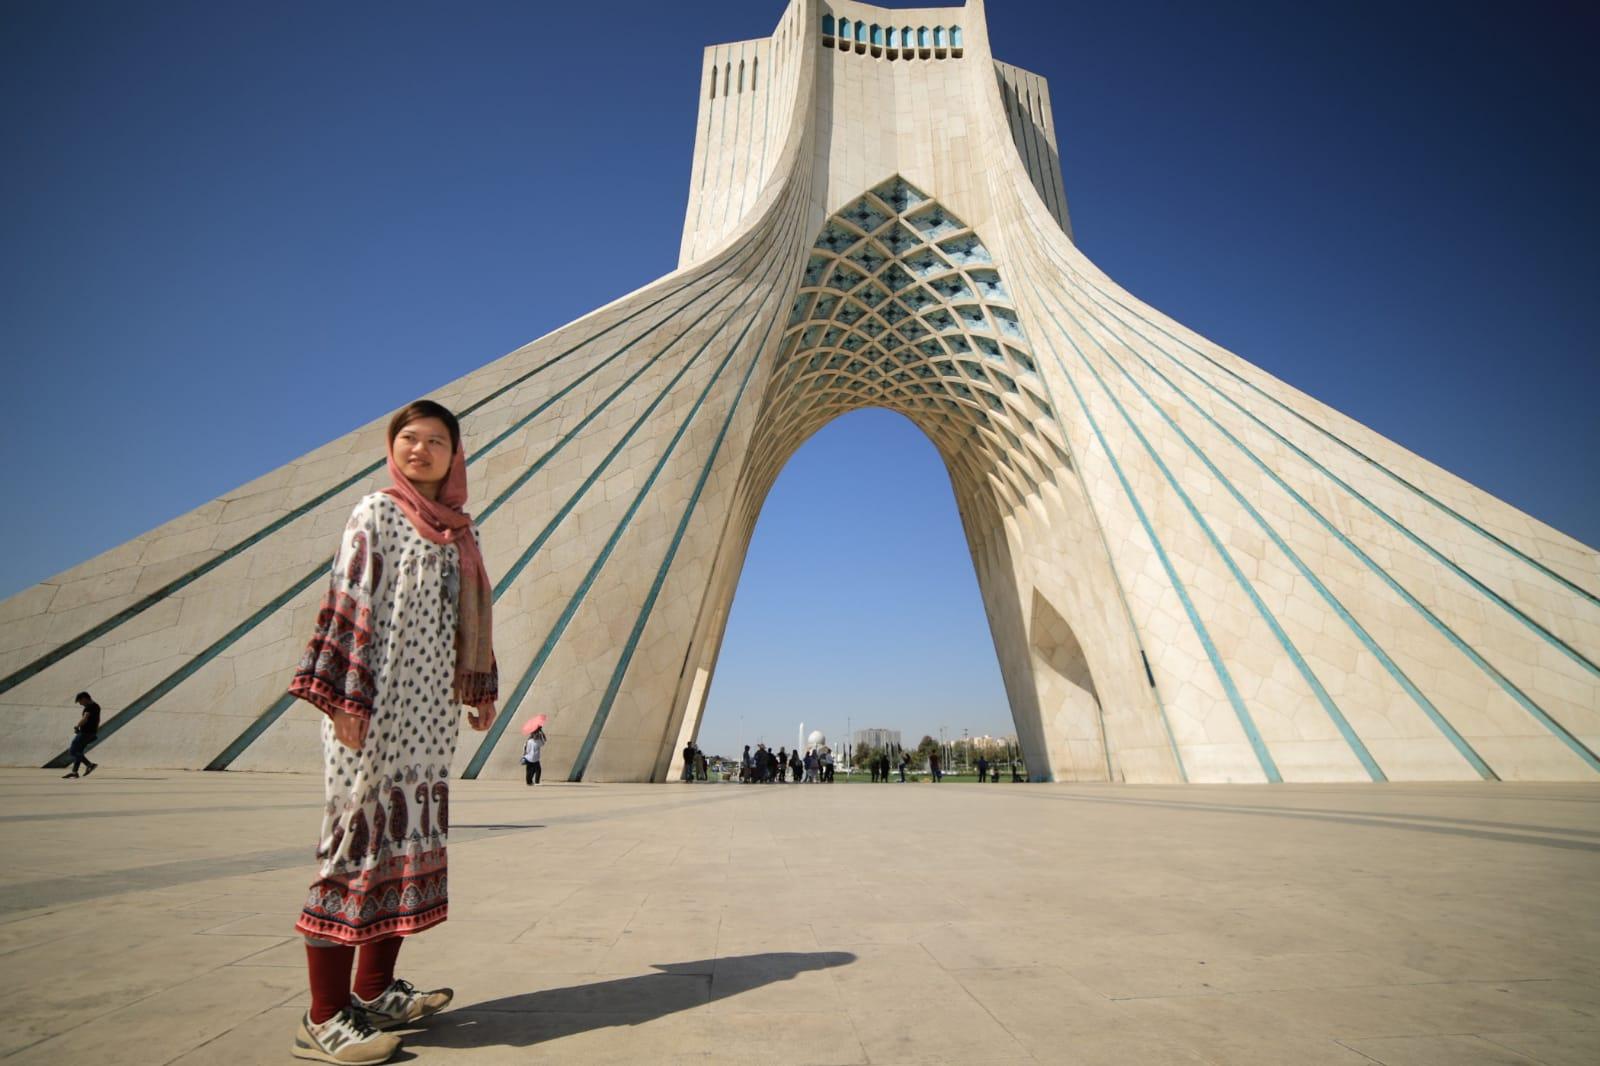 Day 2: Tehran-Qeshm Island